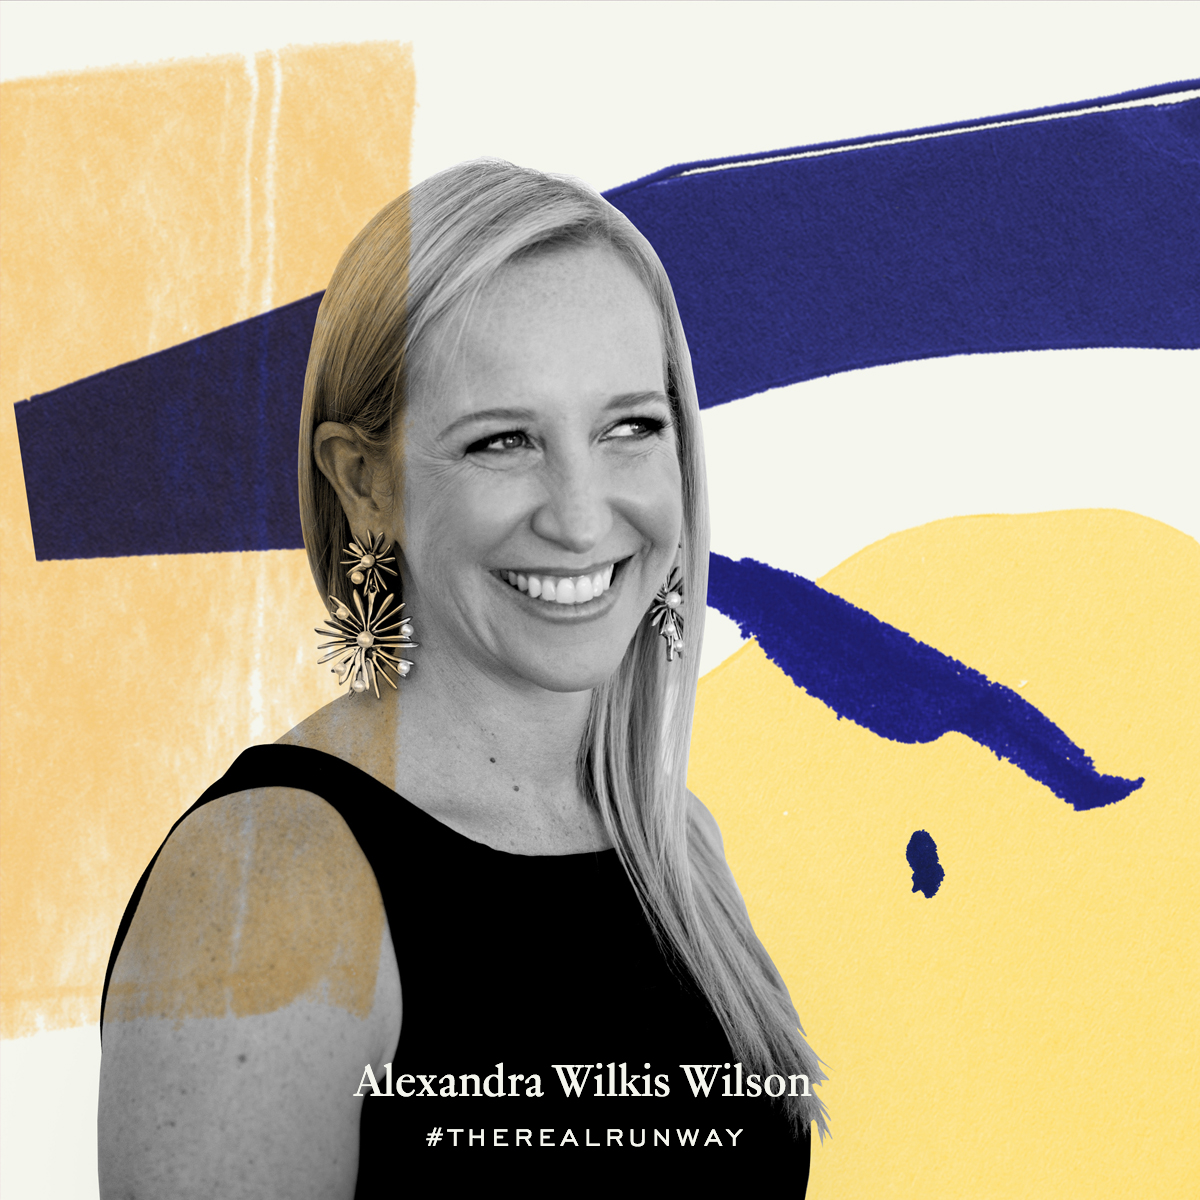 AlexandraWilkisWilson.jpg